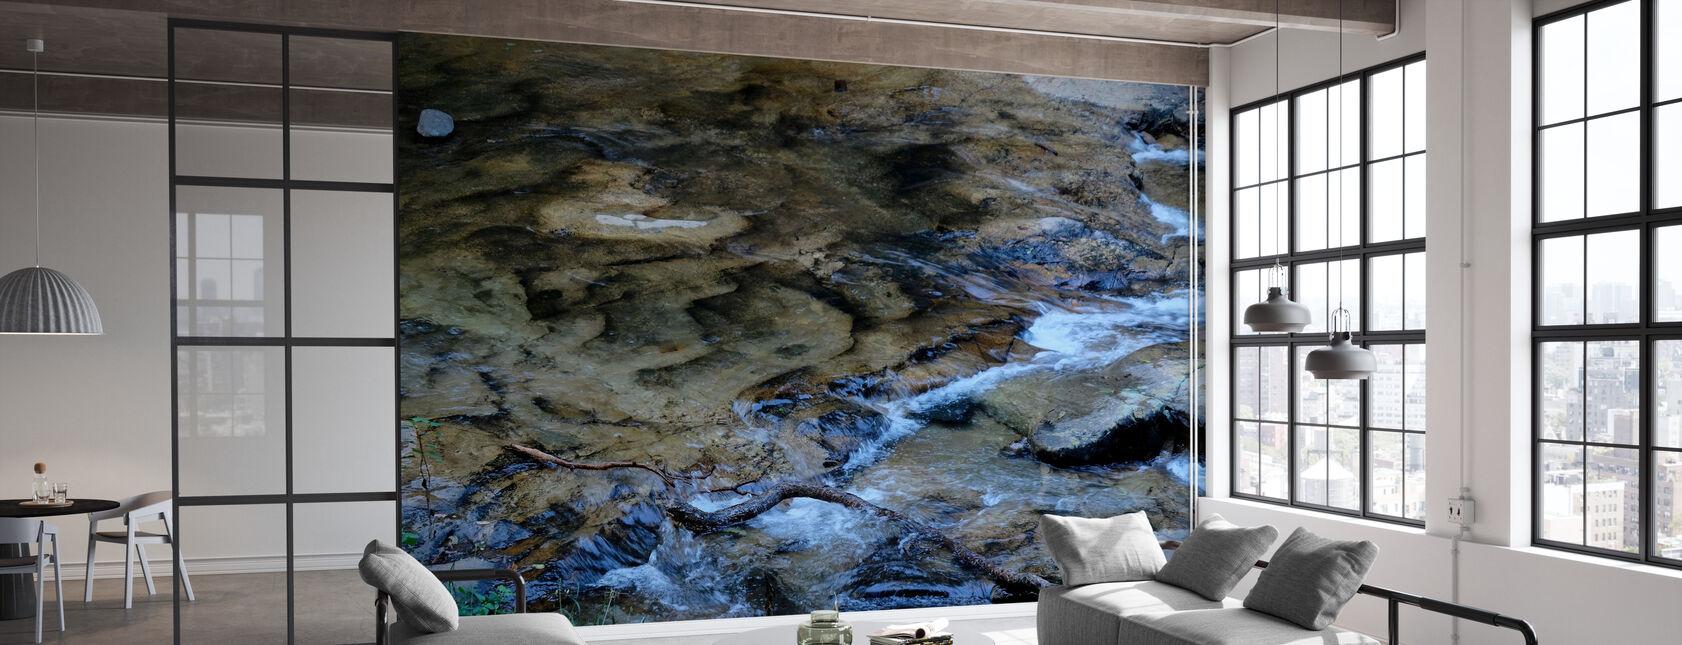 River Flow - Wallpaper - Office